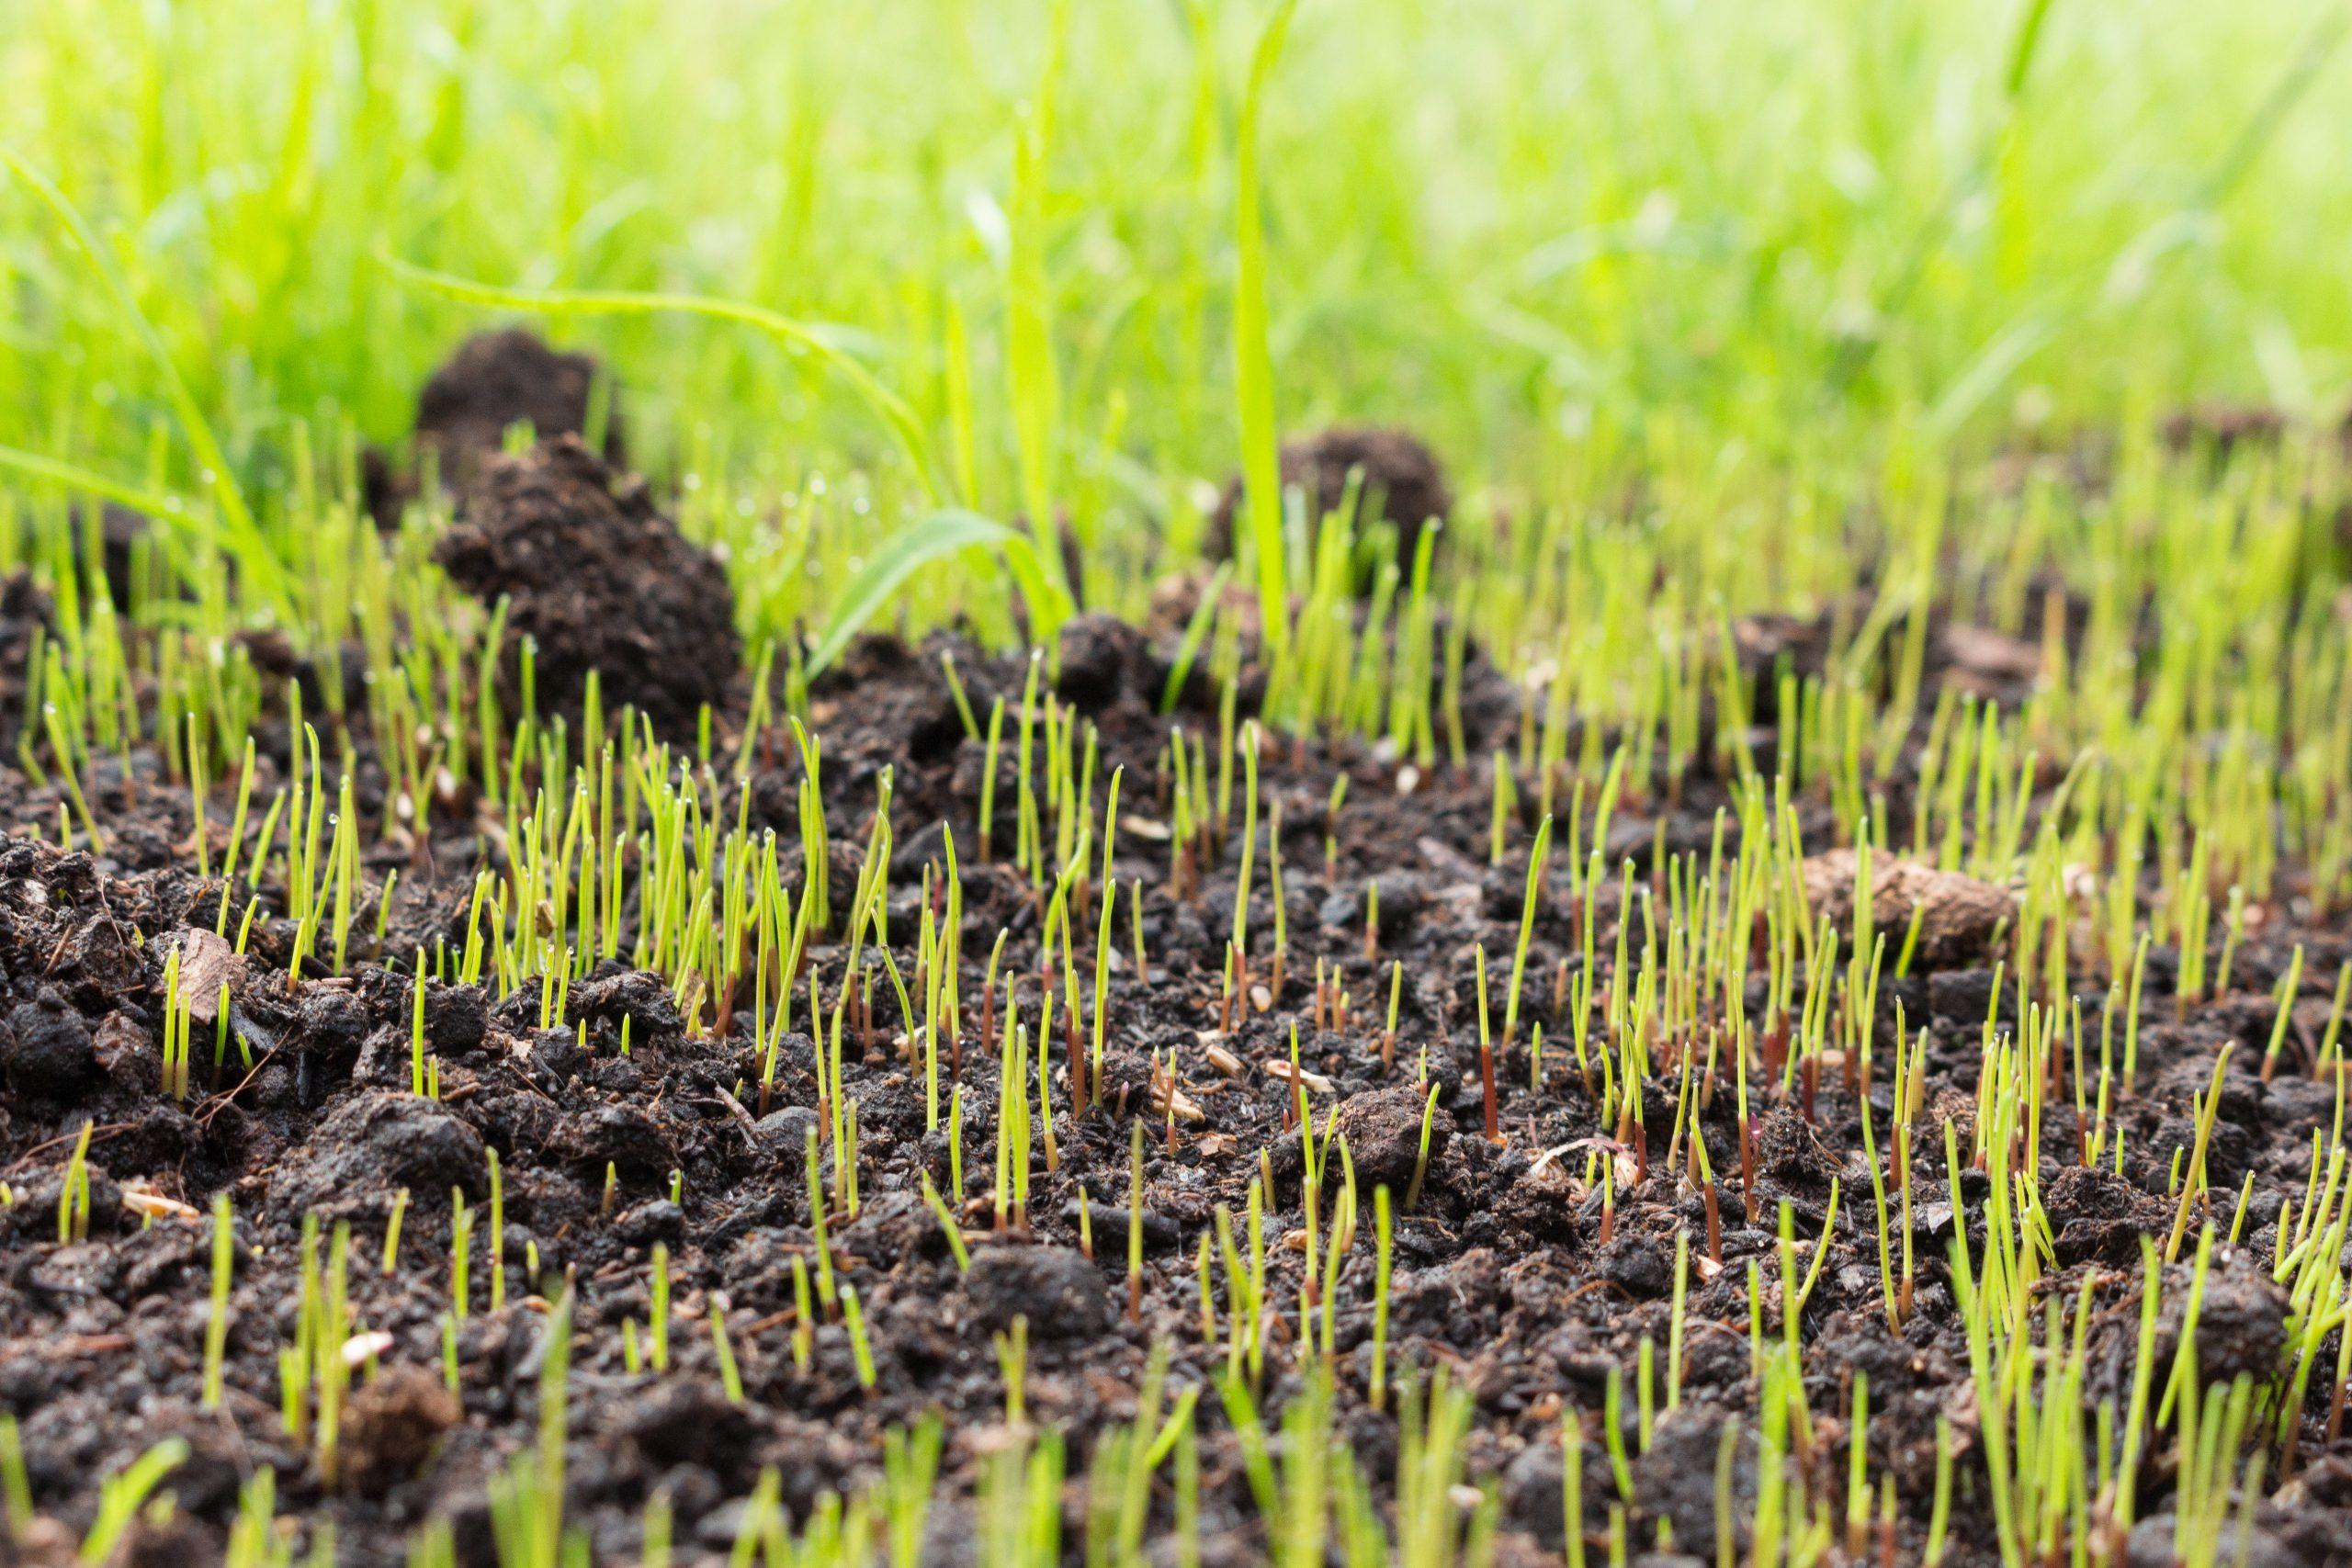 Growing grass plants